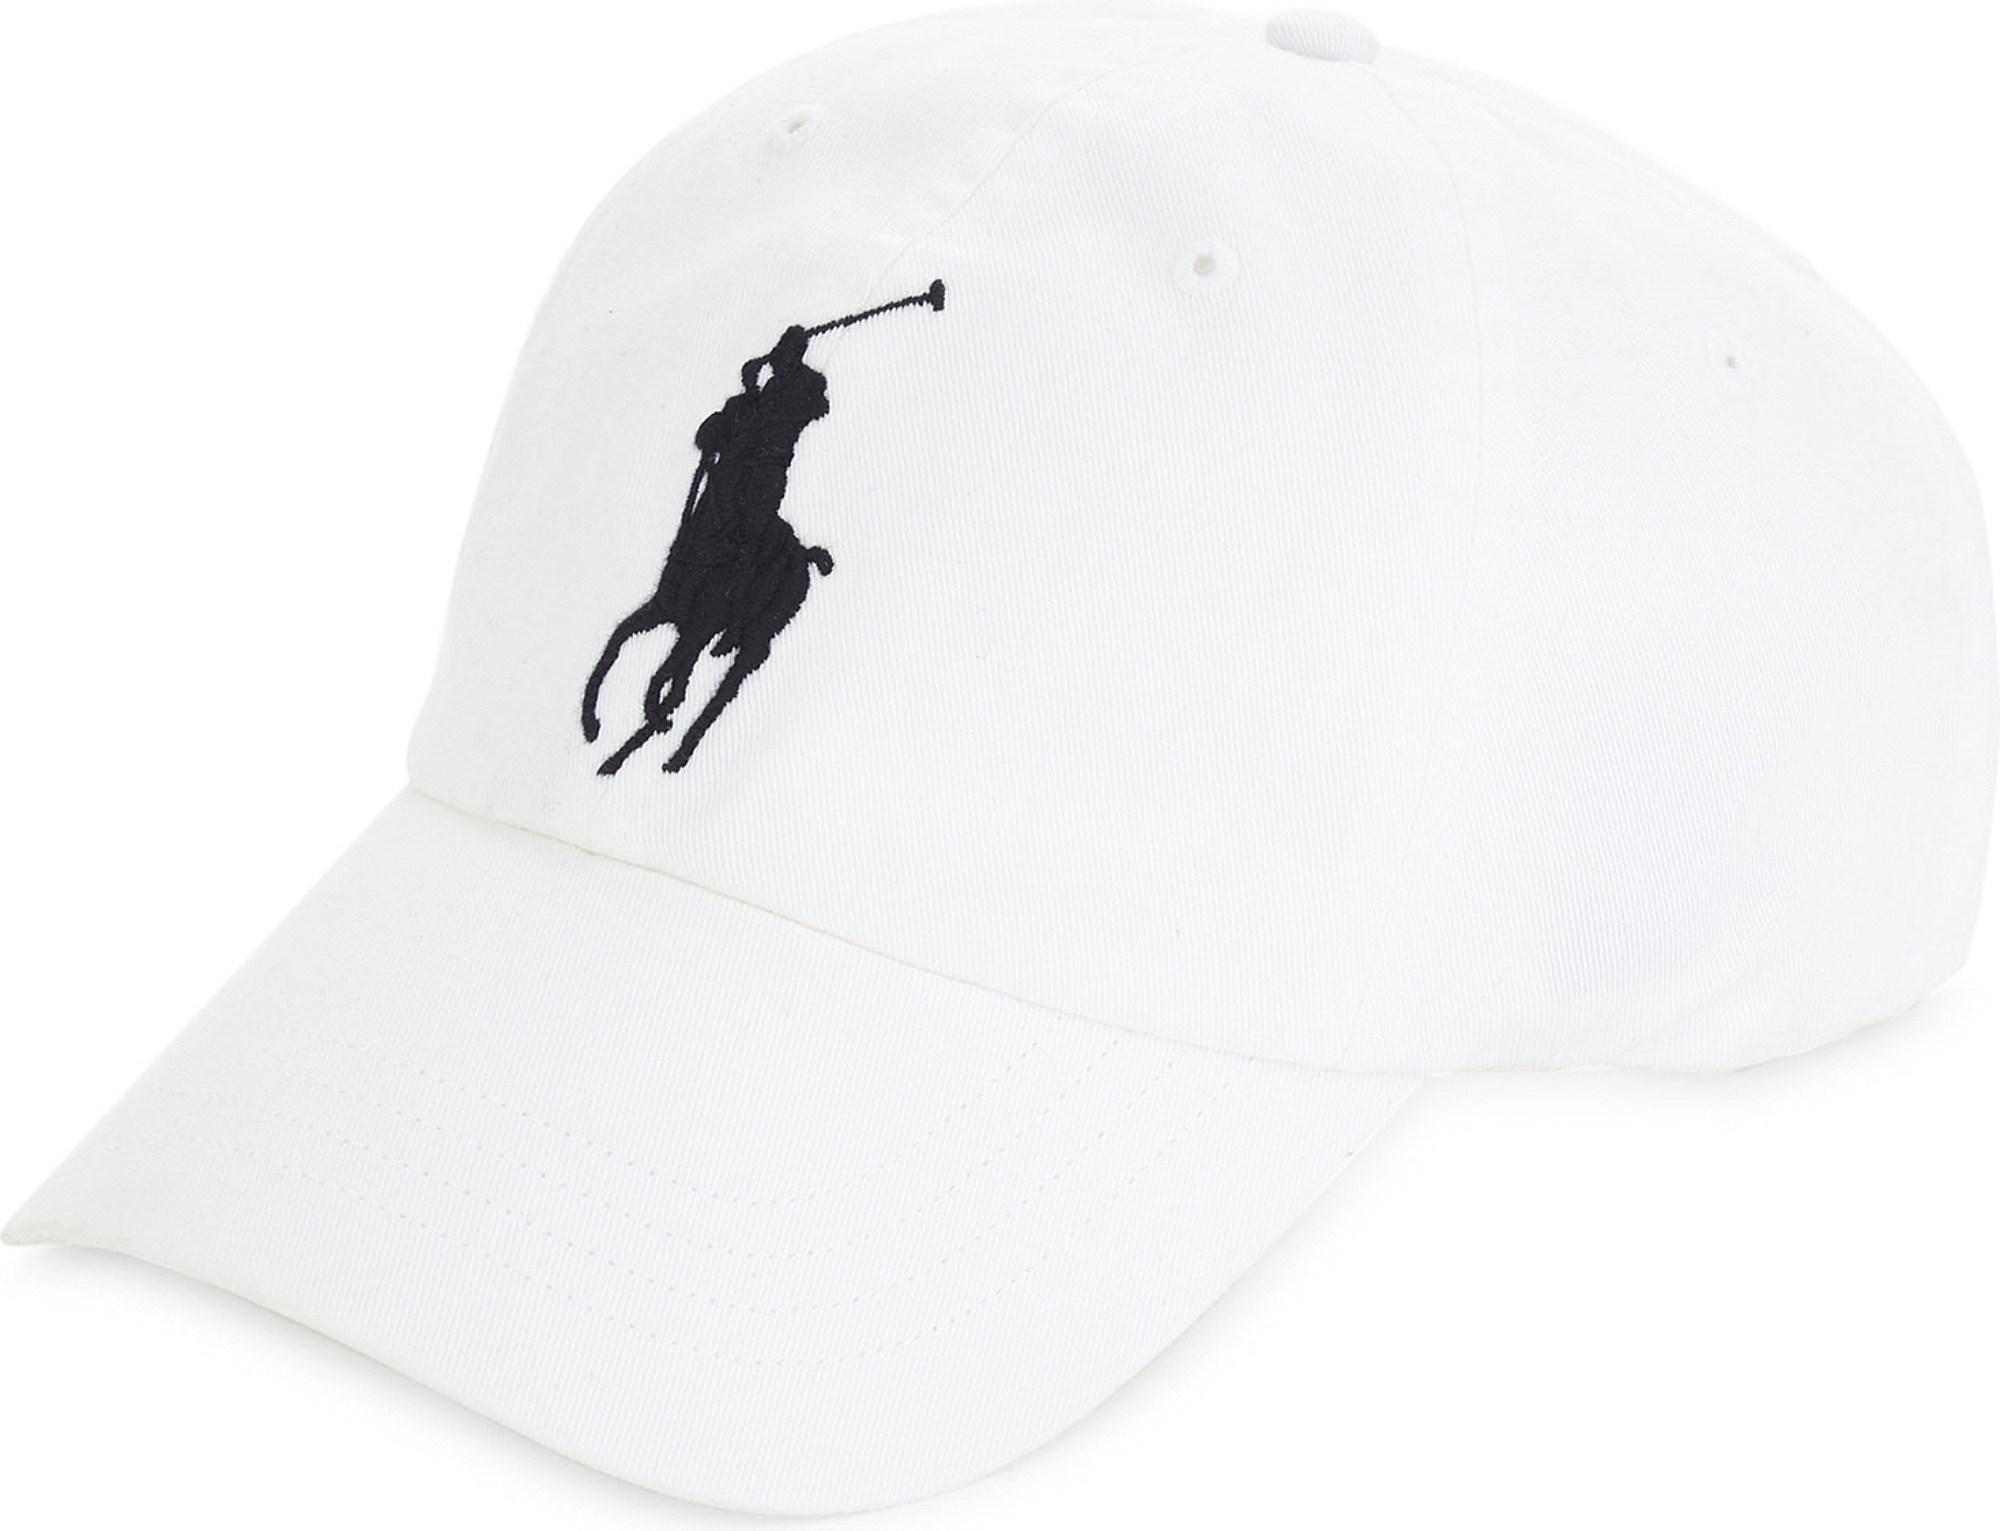 dea98c8ce4a Lyst - Polo Ralph Lauren Embroidered Logo Cotton Cap in White for Men